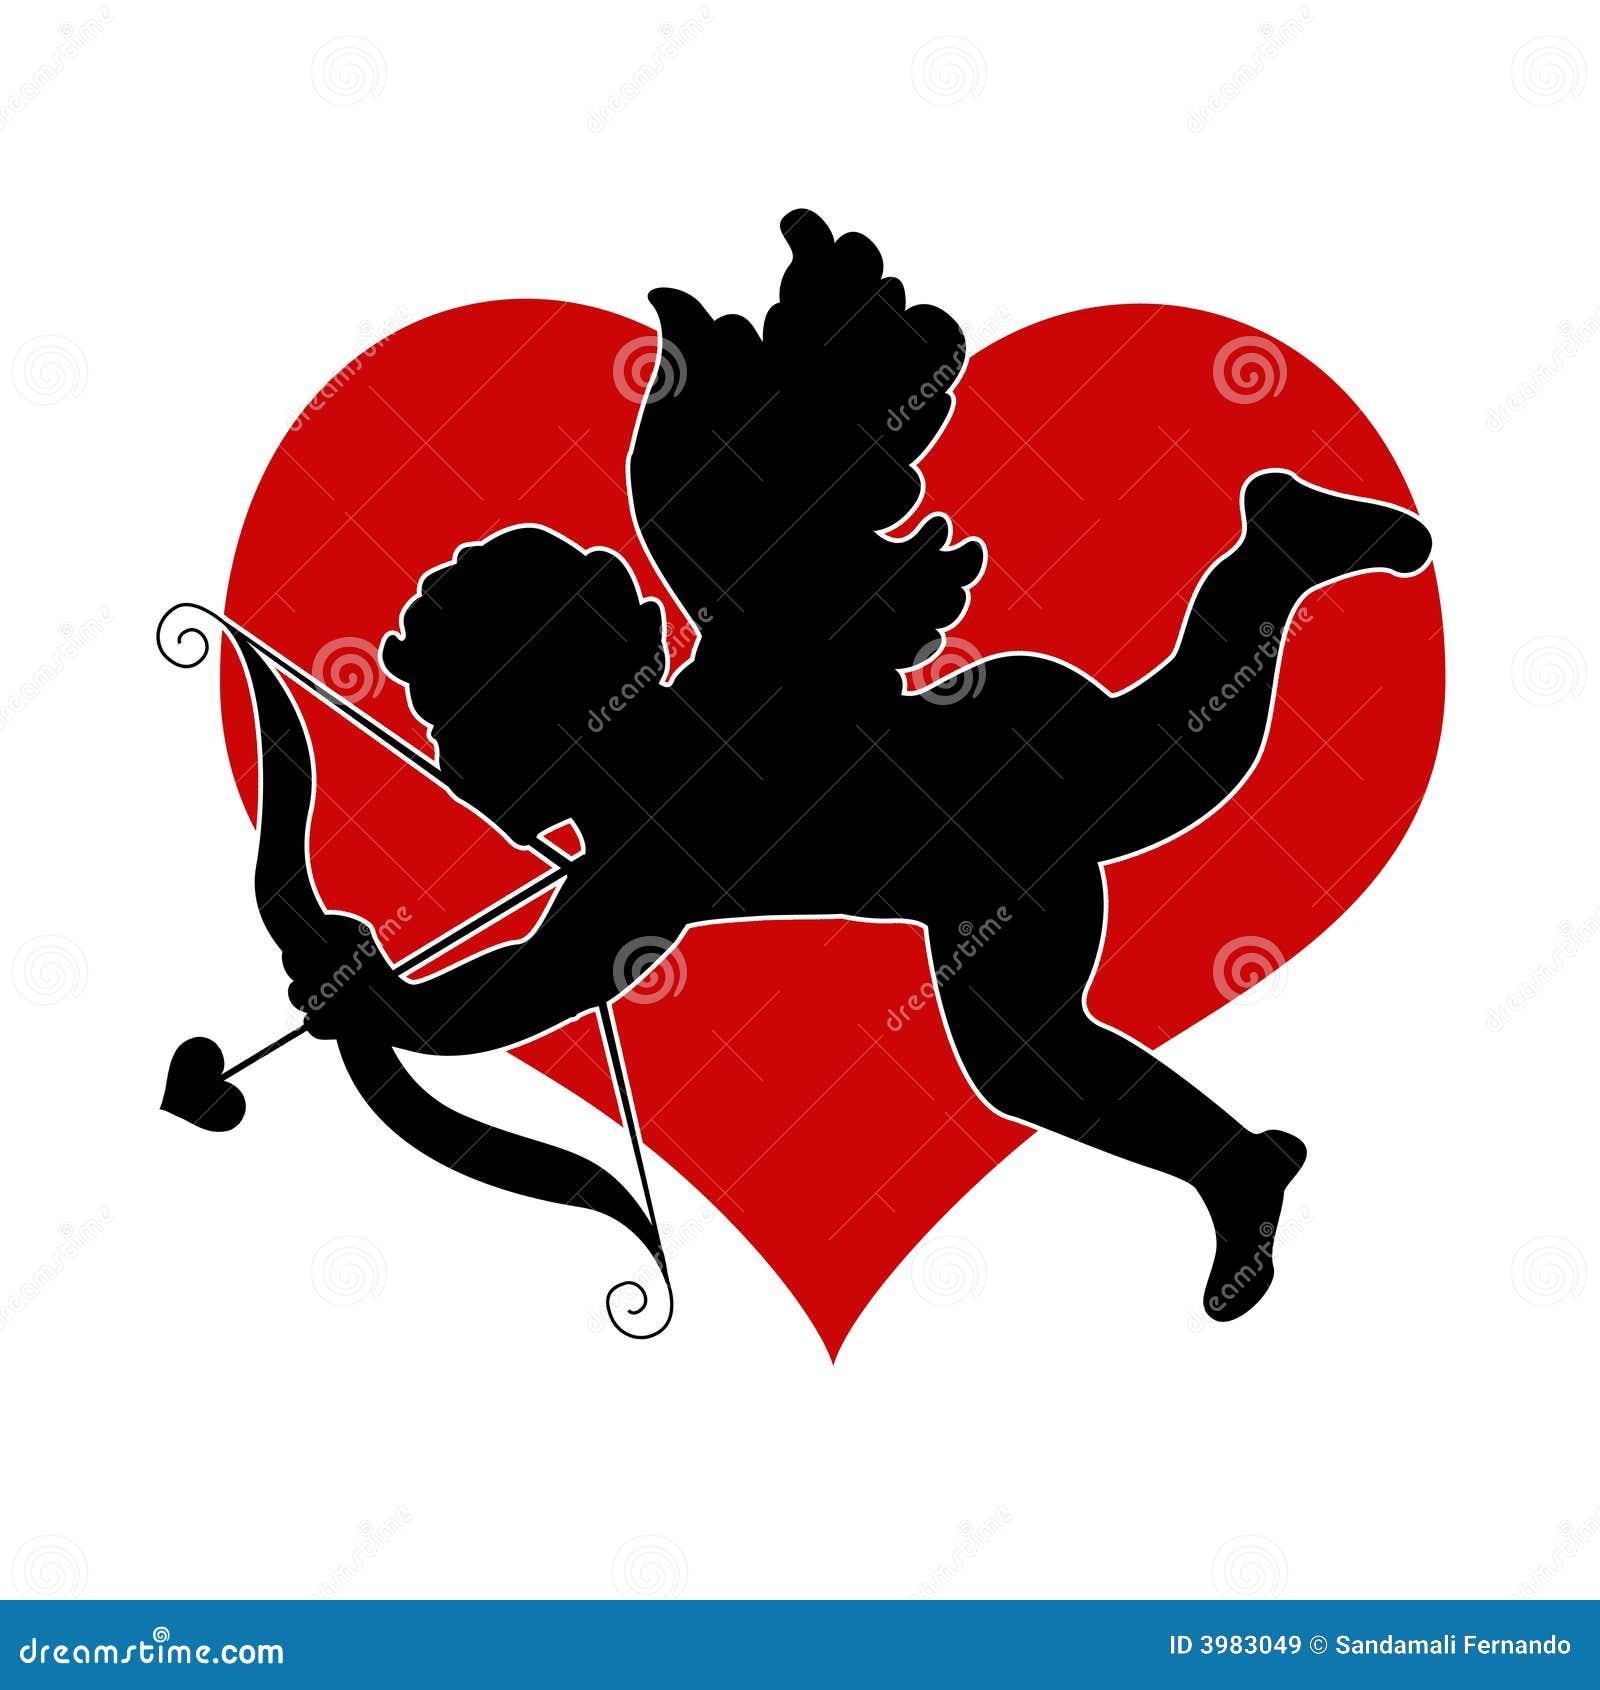 Cupidon coeur datant site fait un AP Rocky datant Iggy Azalea